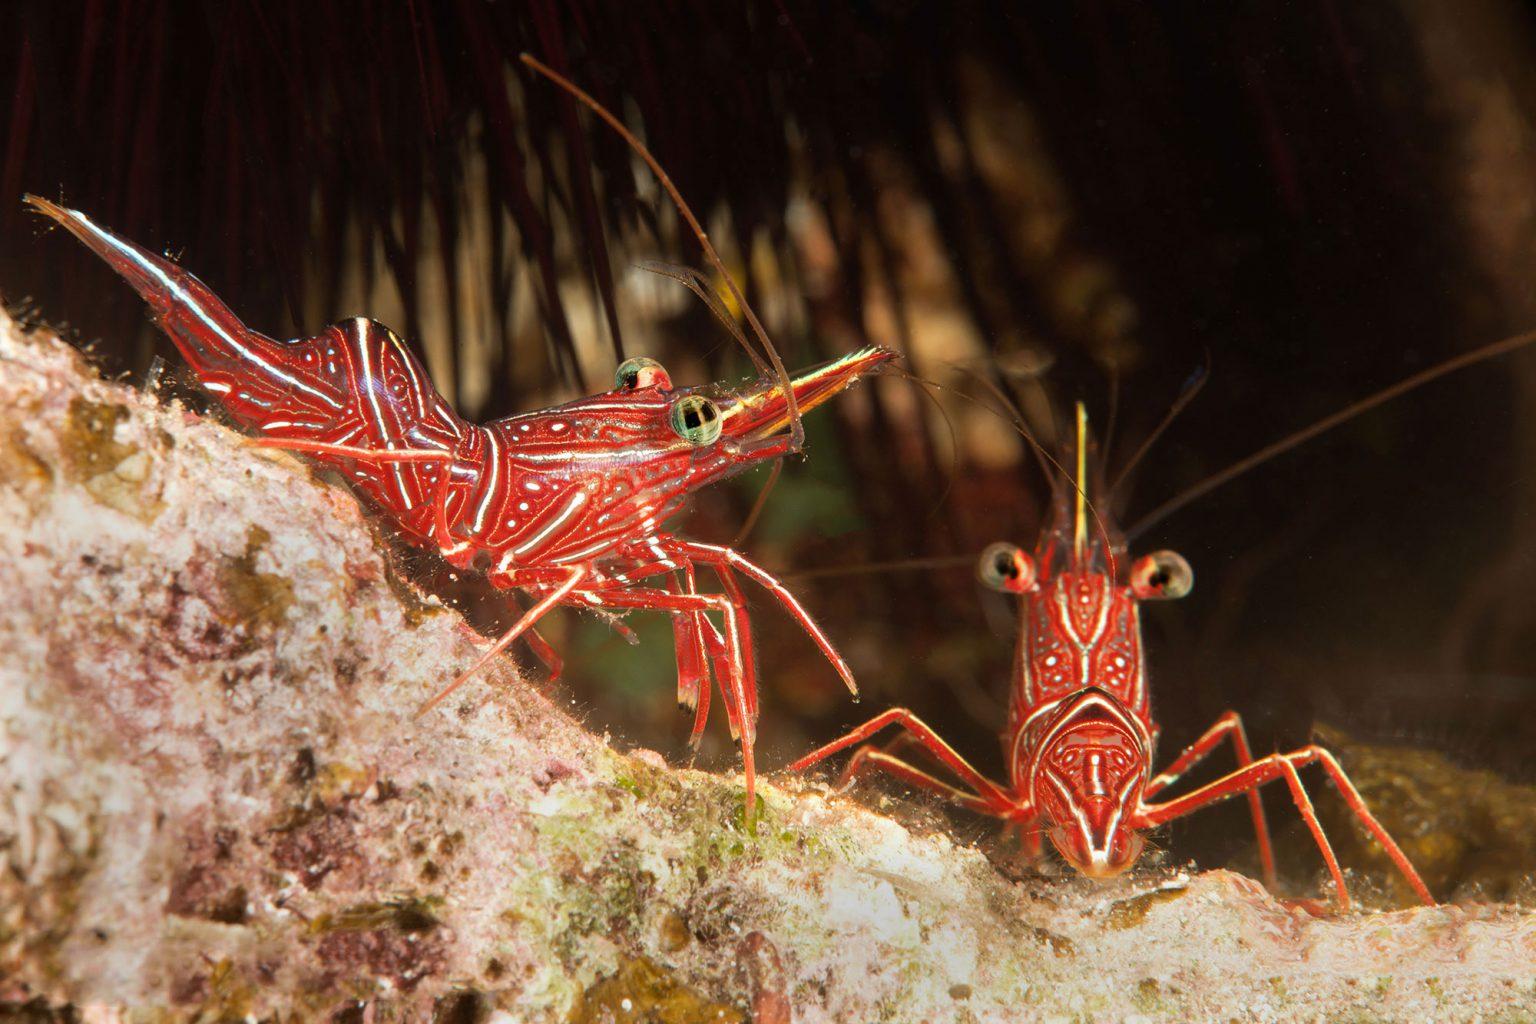 Red Shrimps, Eilat Red Sea, Israel